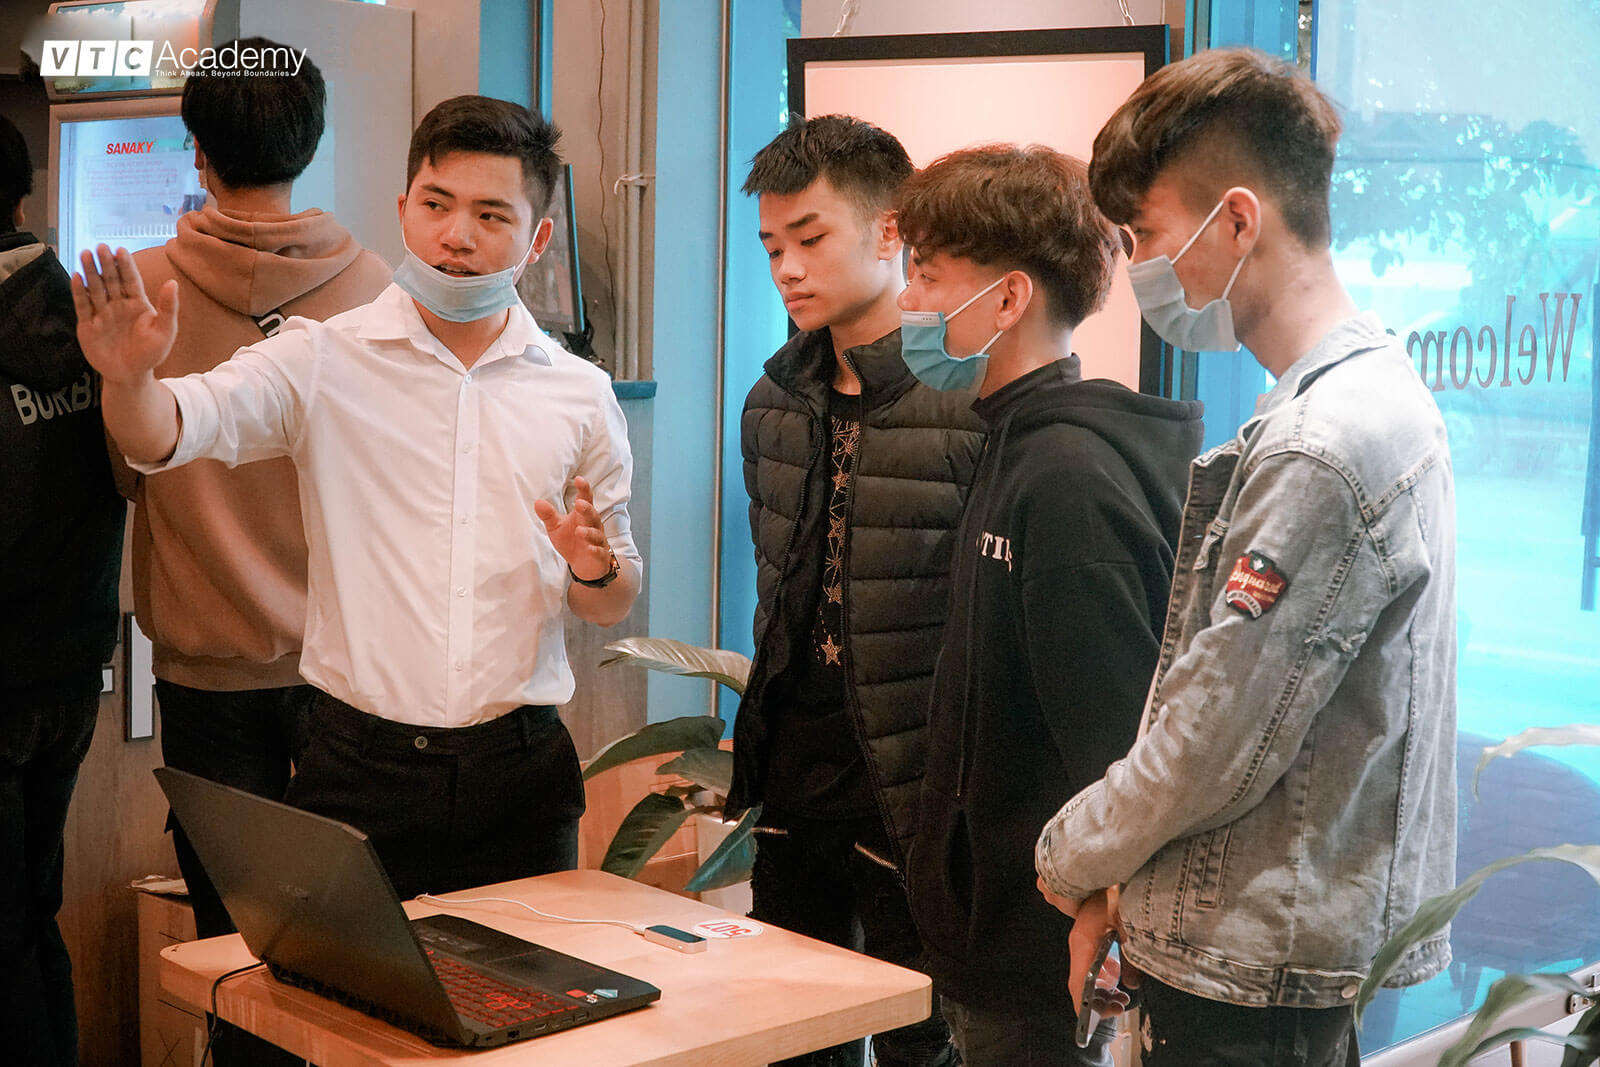 coffee-talk-phu-tho-vtc-academy-3